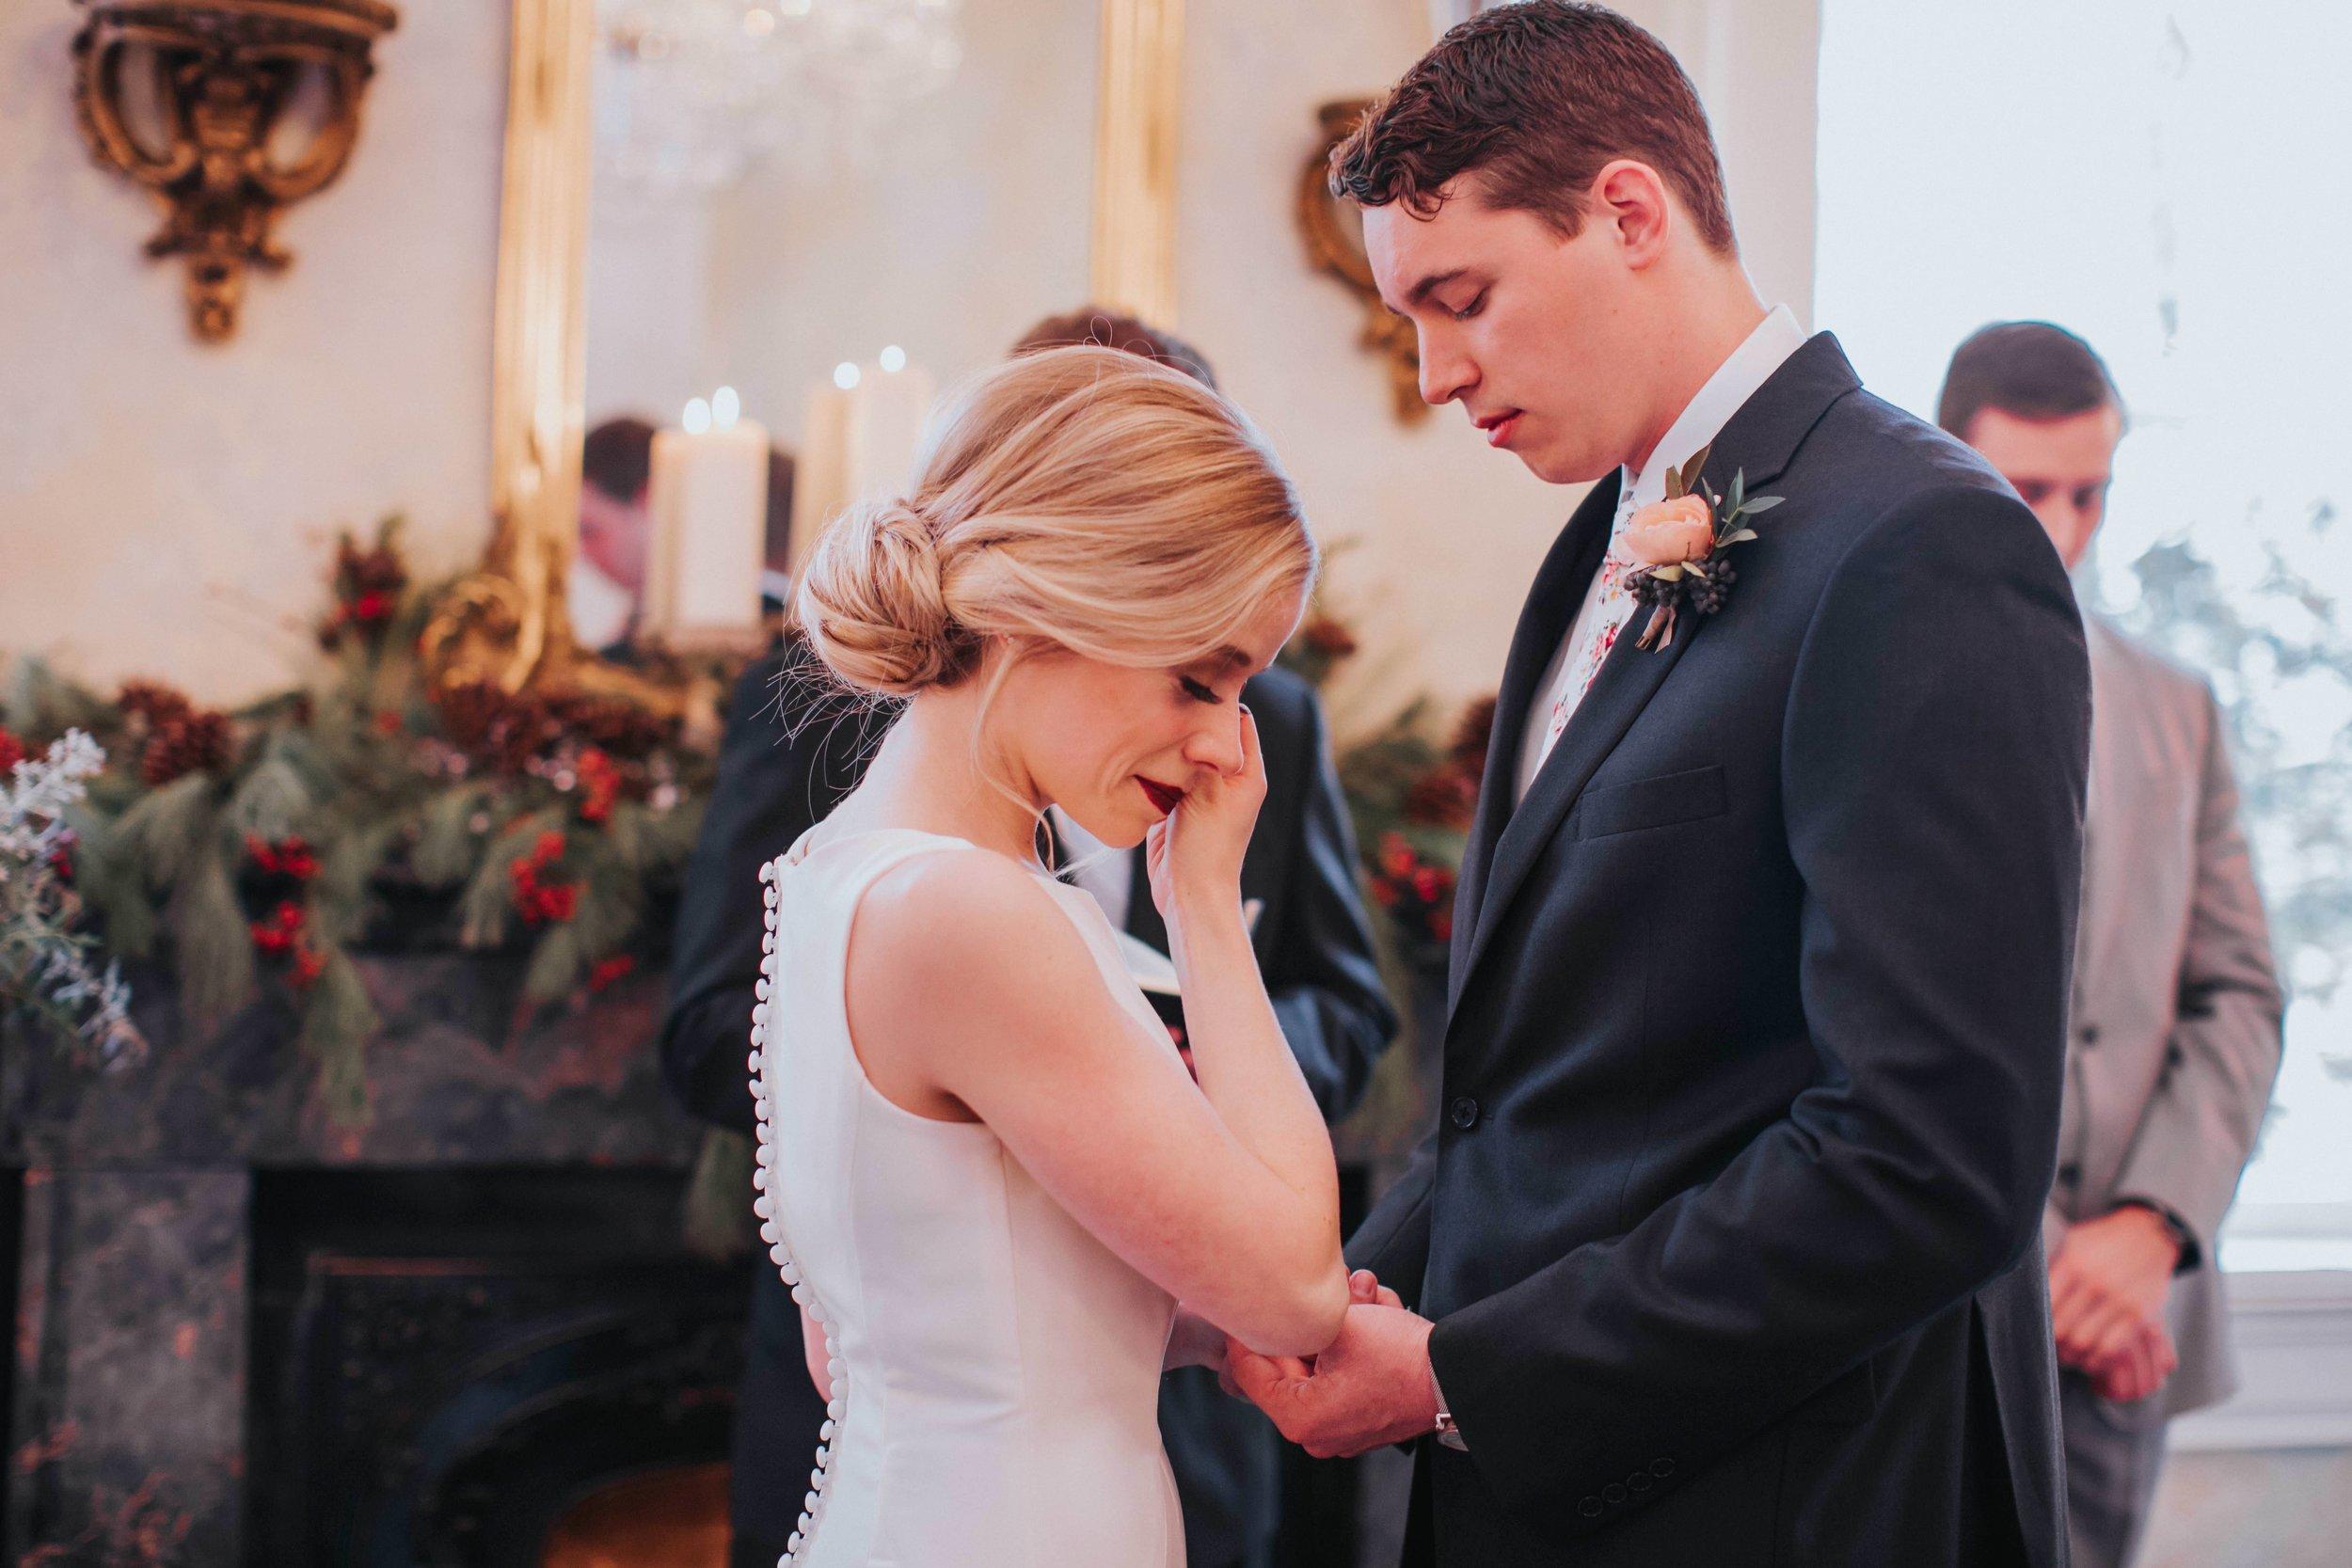 Charis_Lauren_Romantic_Wedding_Photographer_Nashville_03A1459.jpg